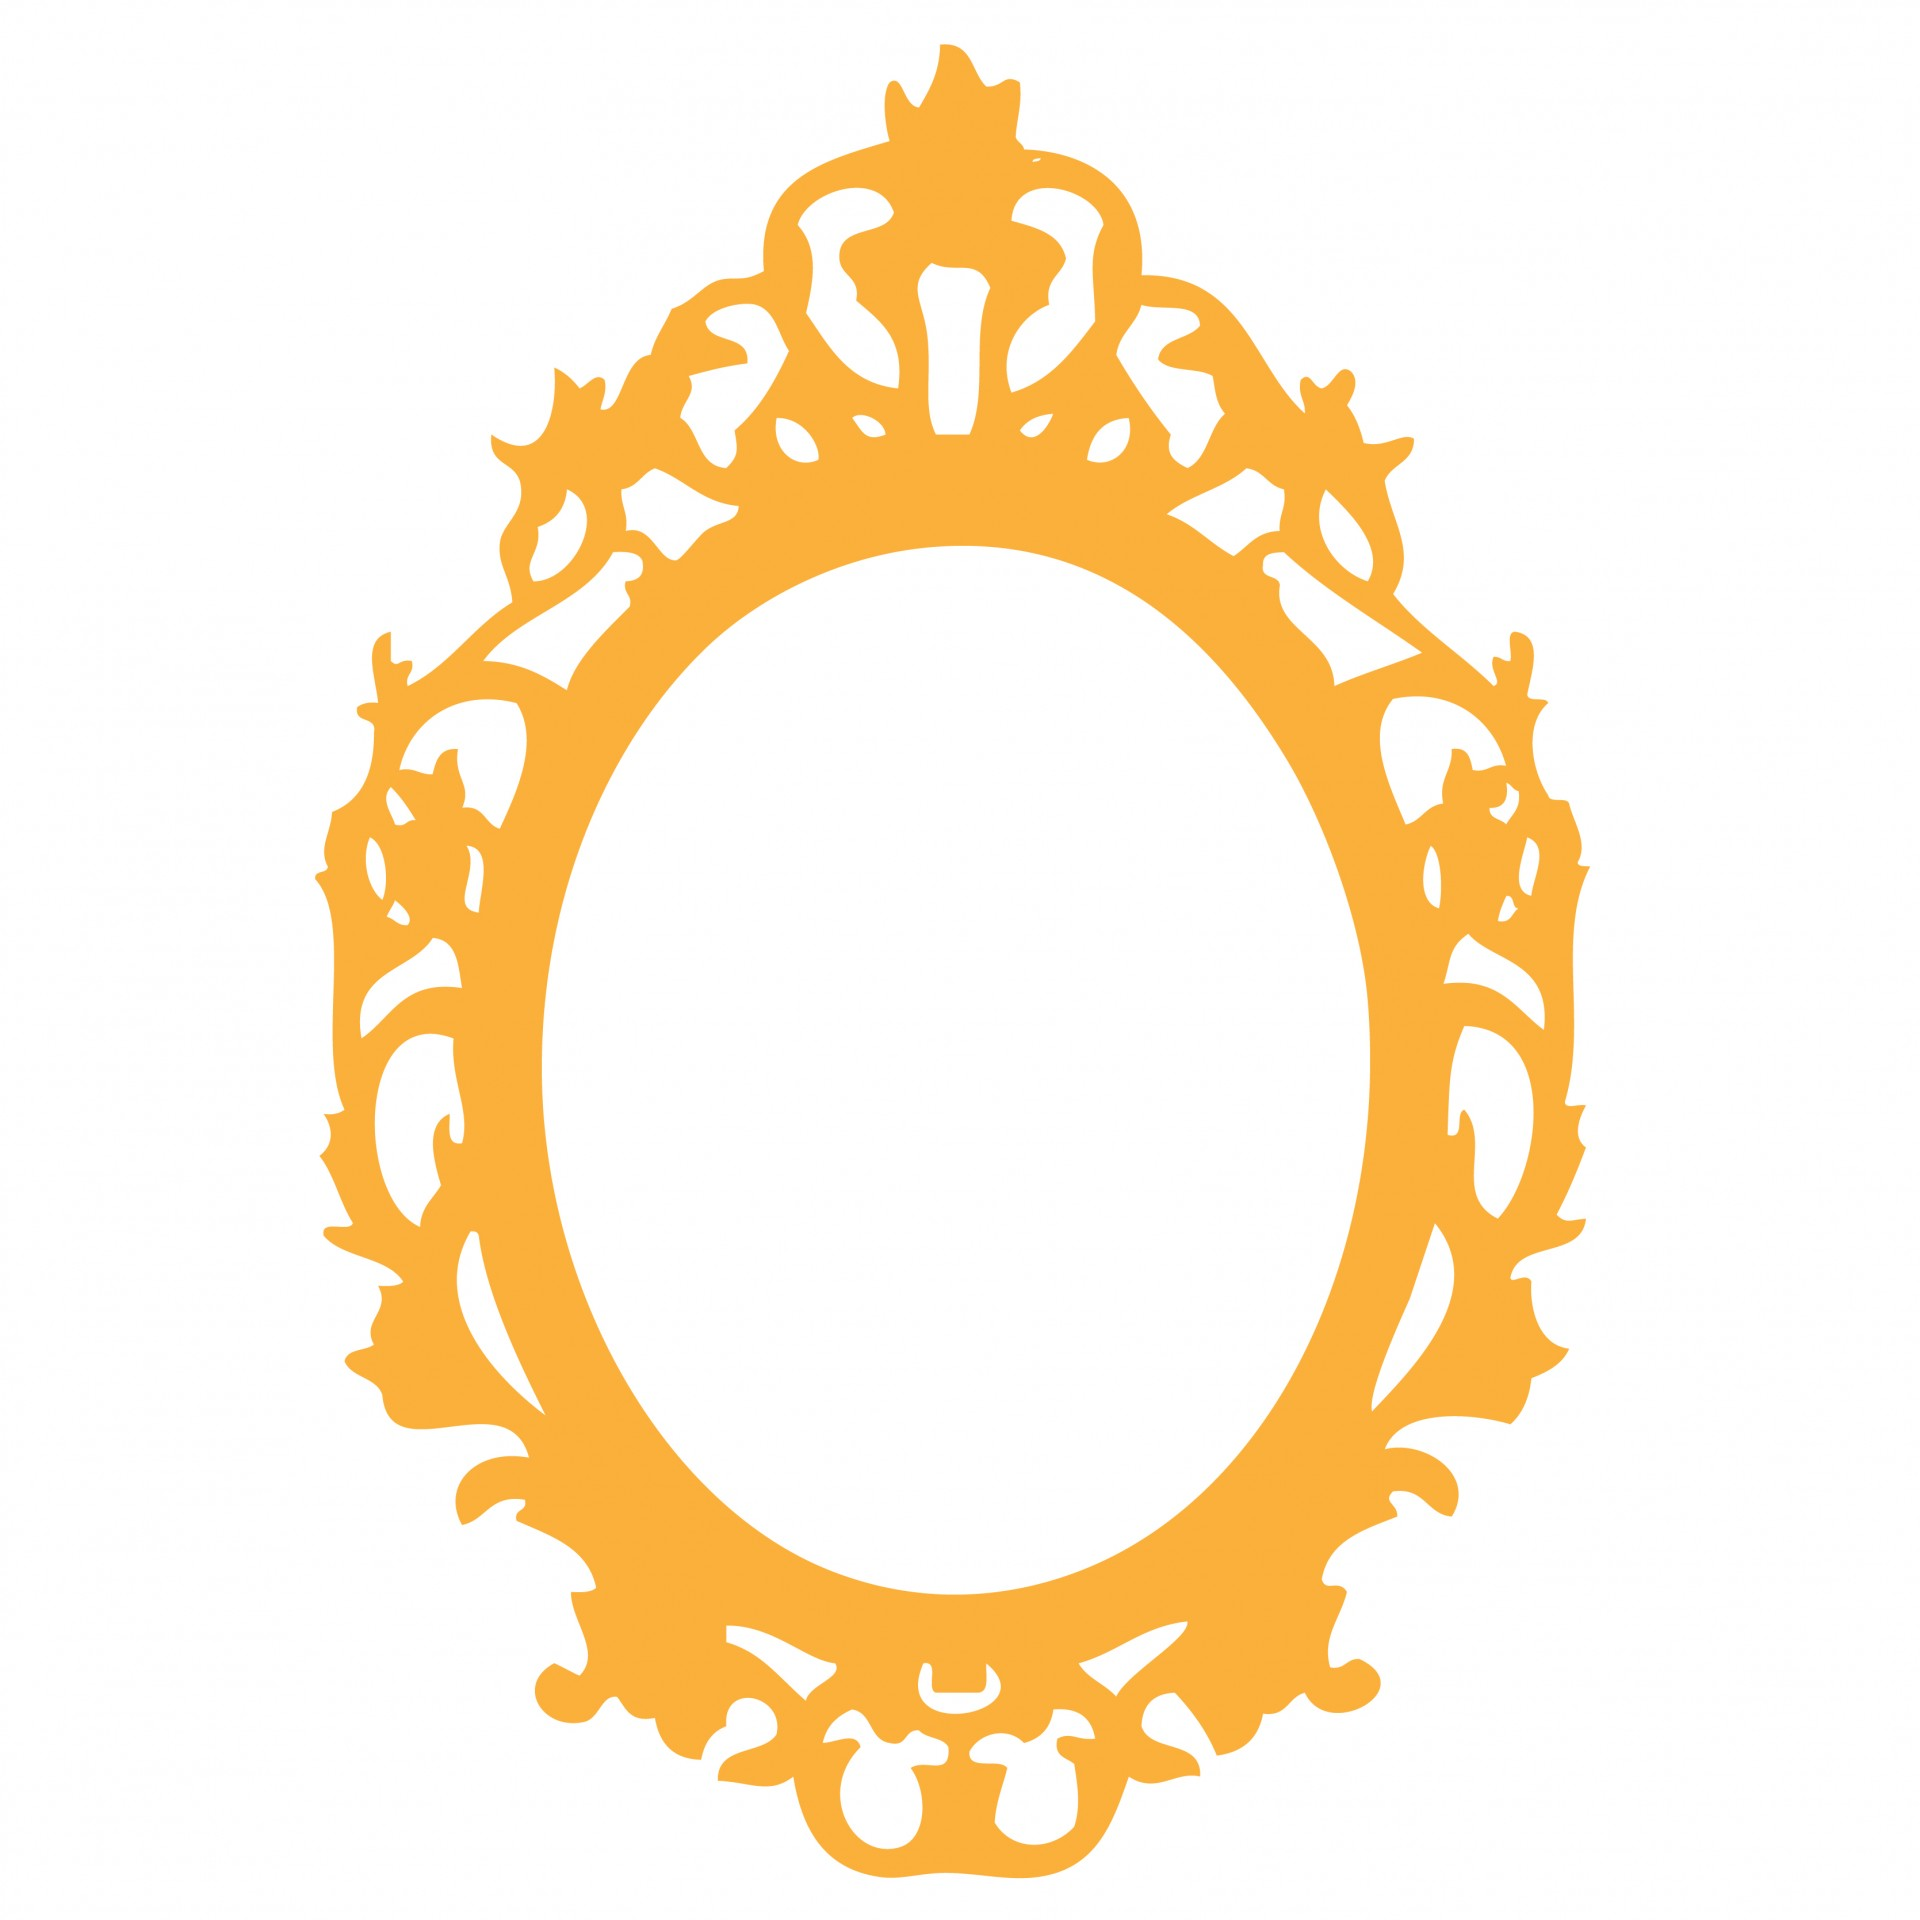 Ornate Orange Frame Clipart Free Stock Photo.